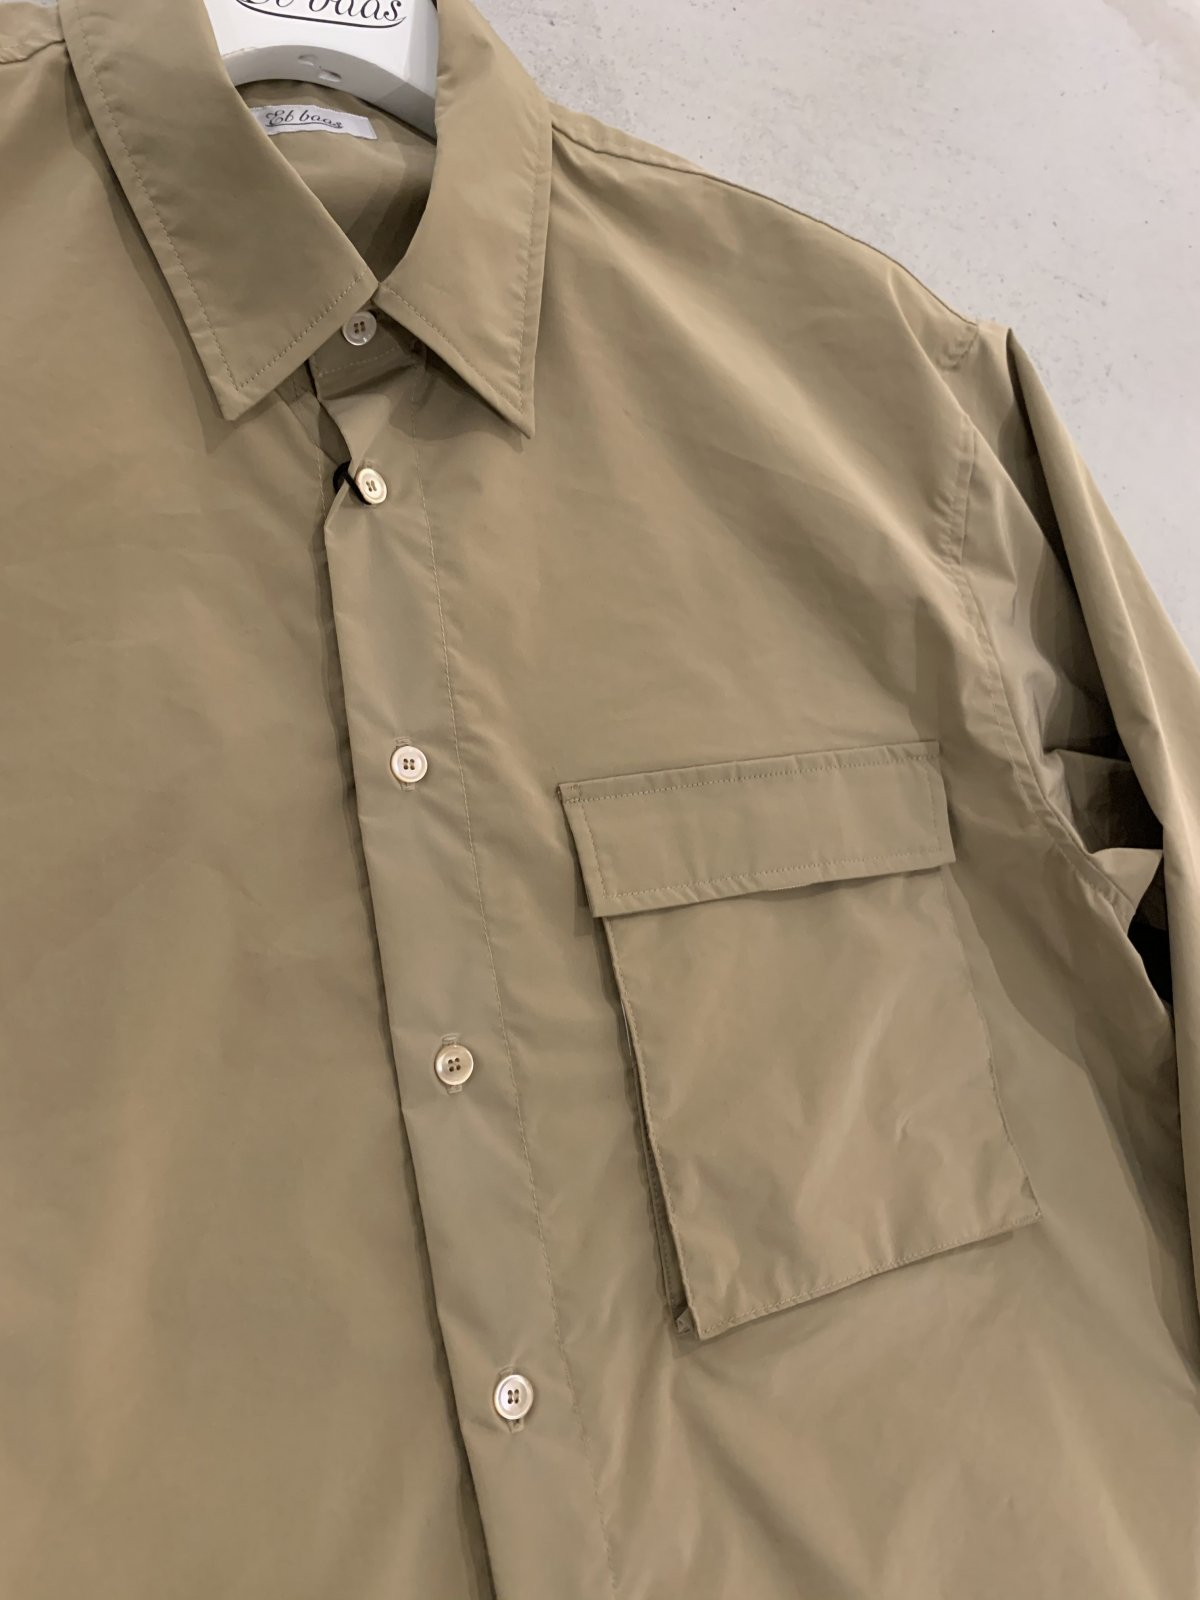 Et baas CAPABLE Shirts 詳細画像15